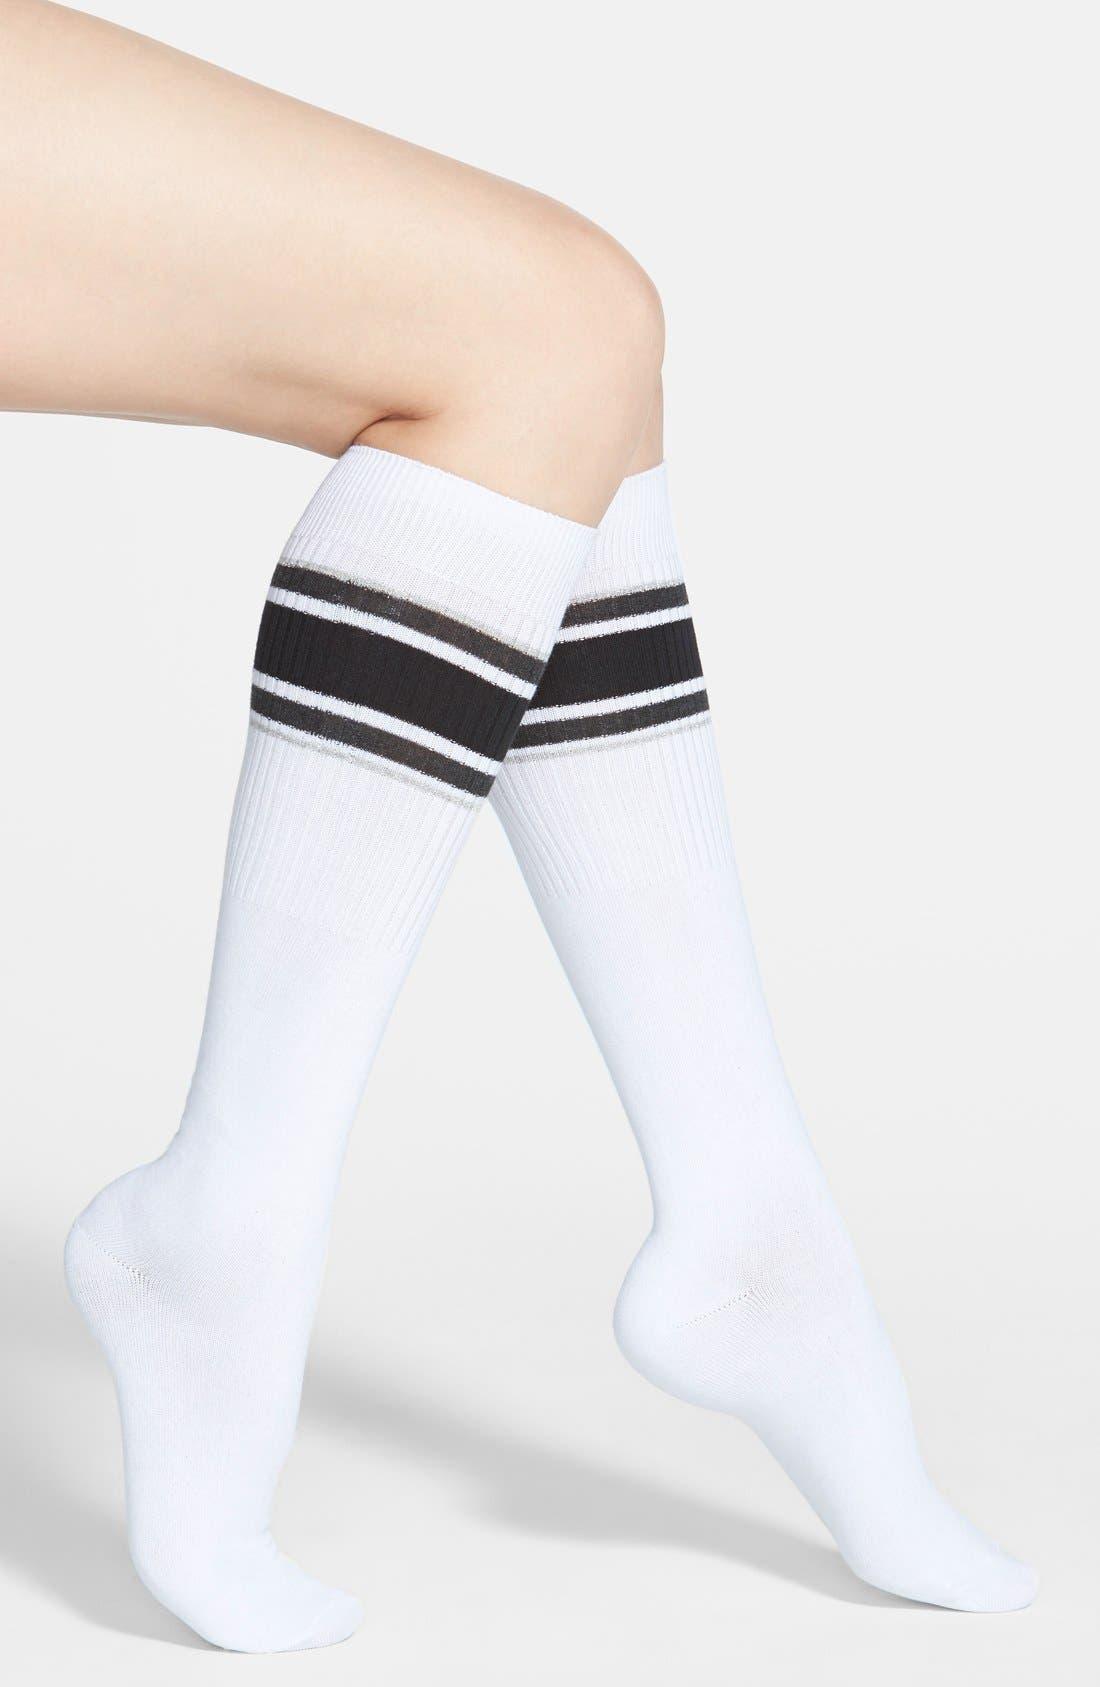 Alternate Image 1 Selected - Hot Sox Athletic Stripe Knee High Socks